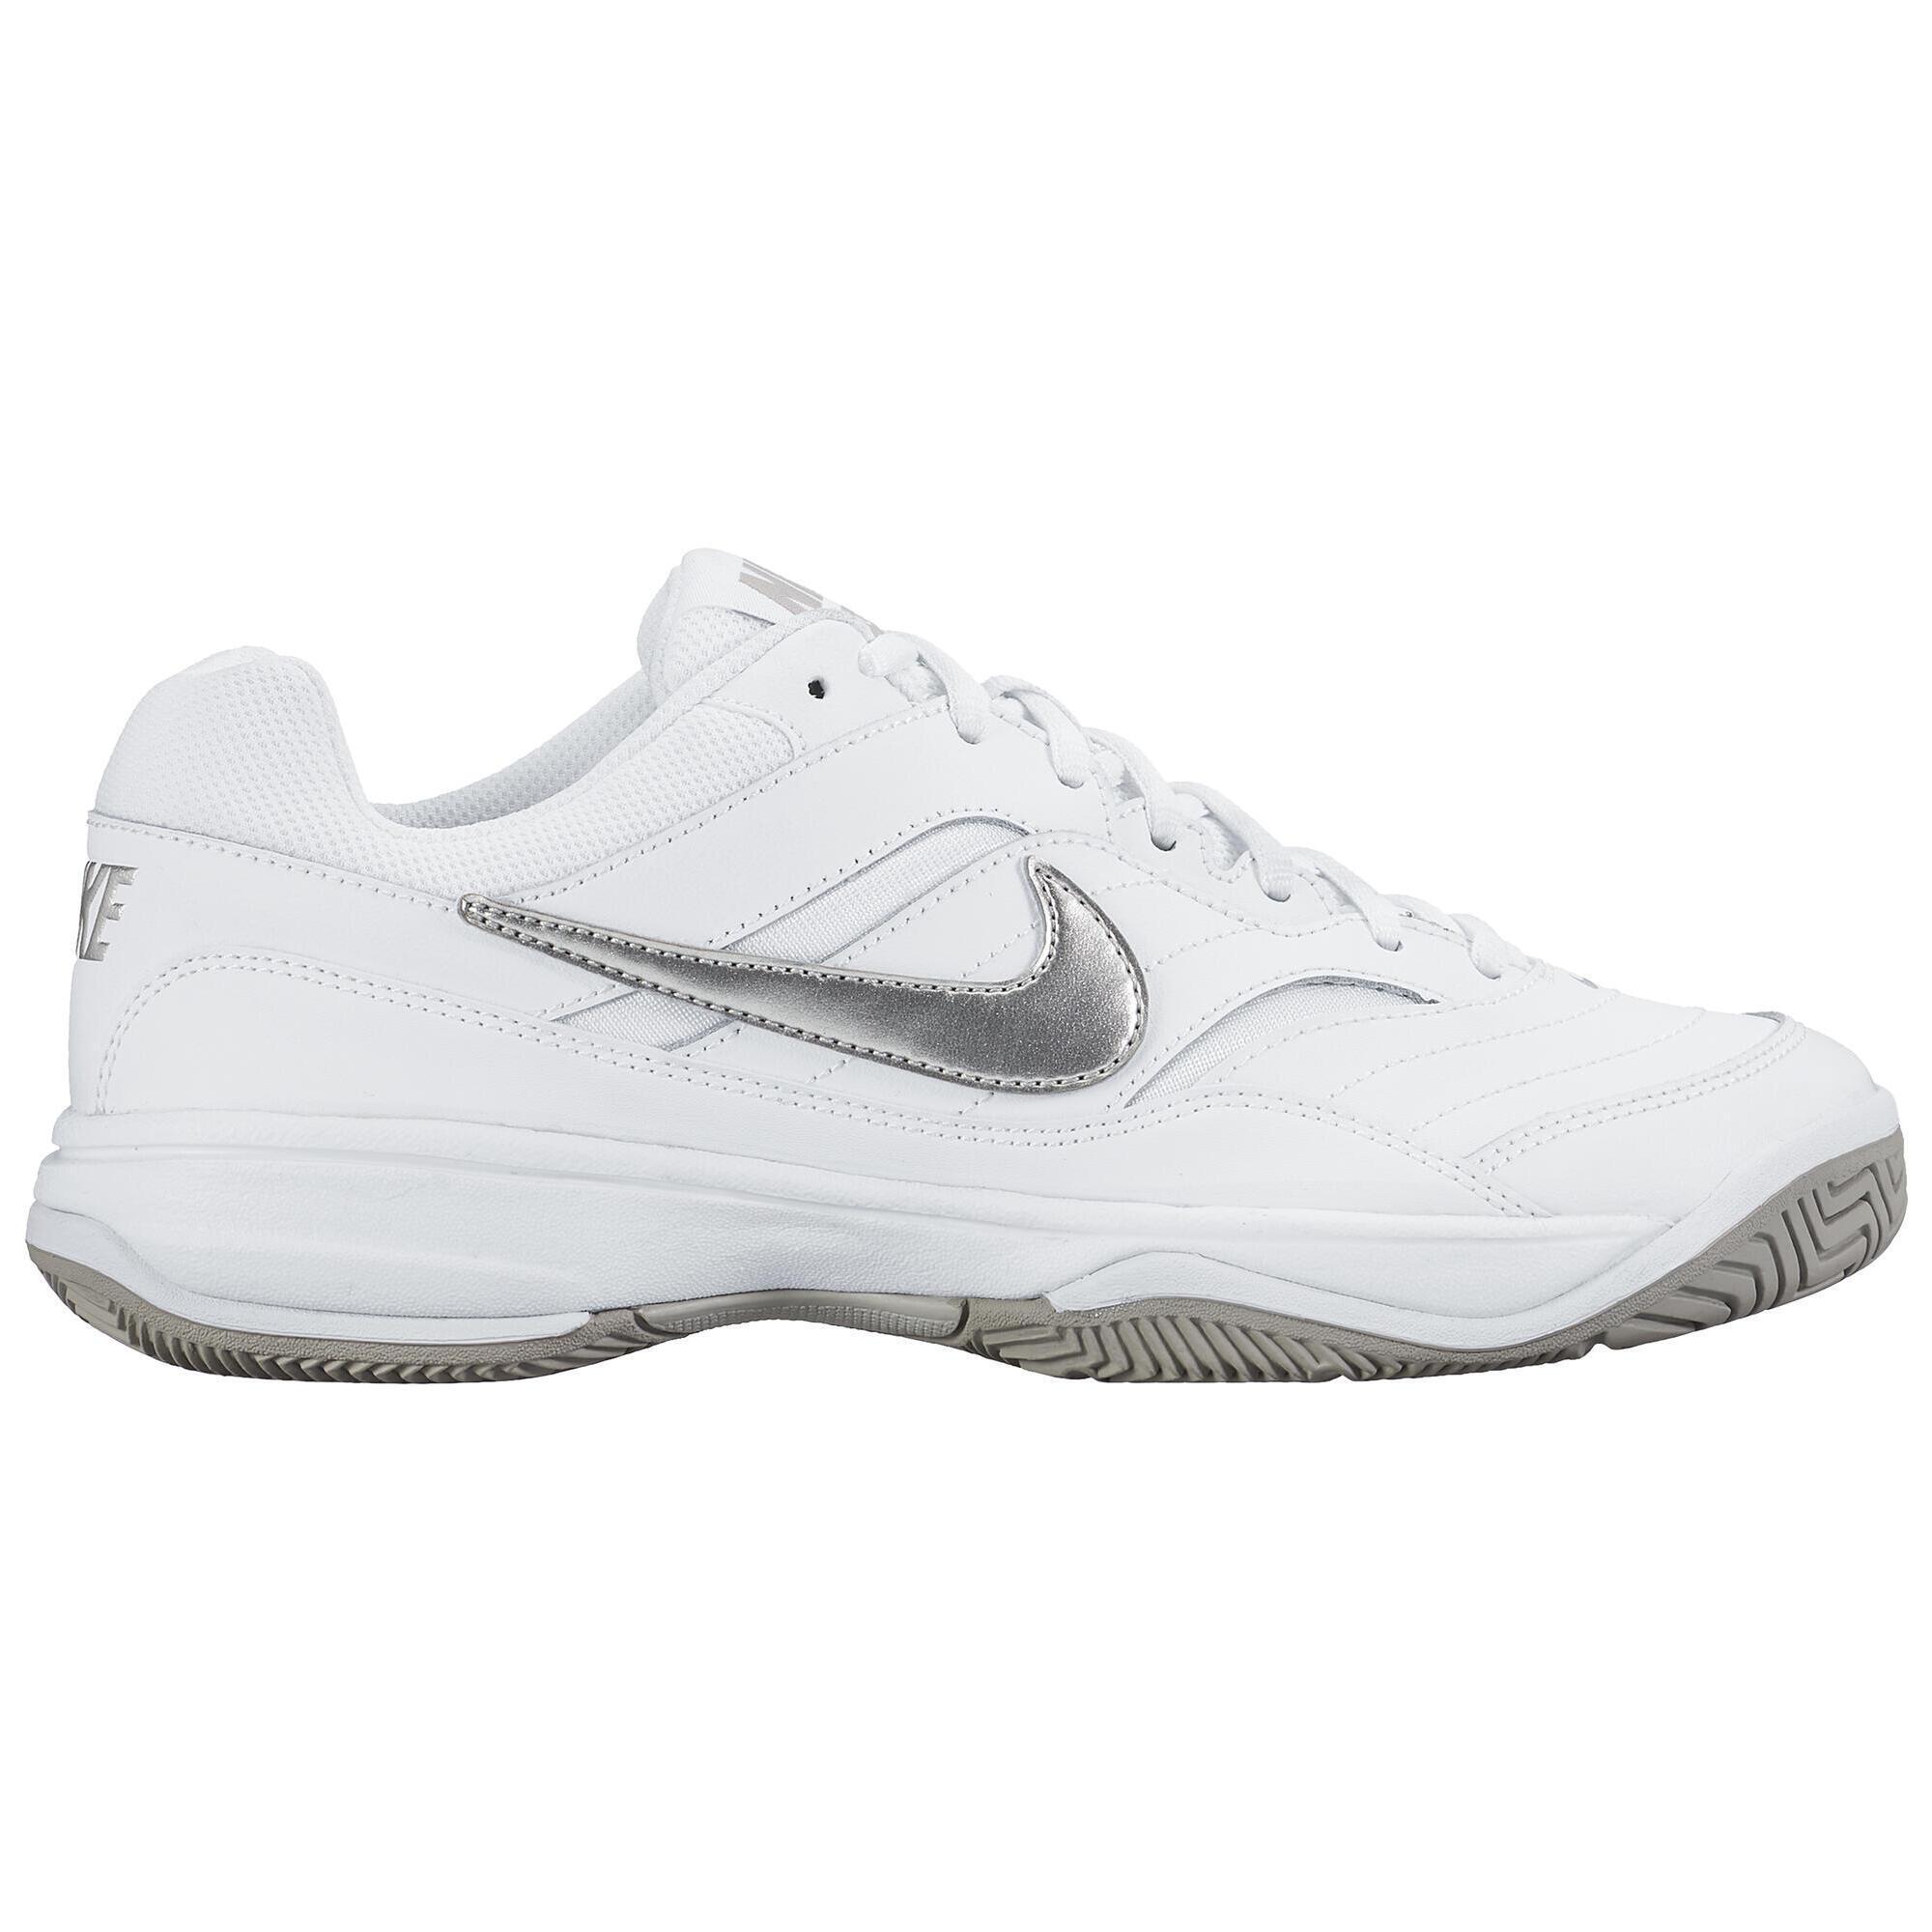 2080820 Nike Tennisschoenen dames Court Lite wit